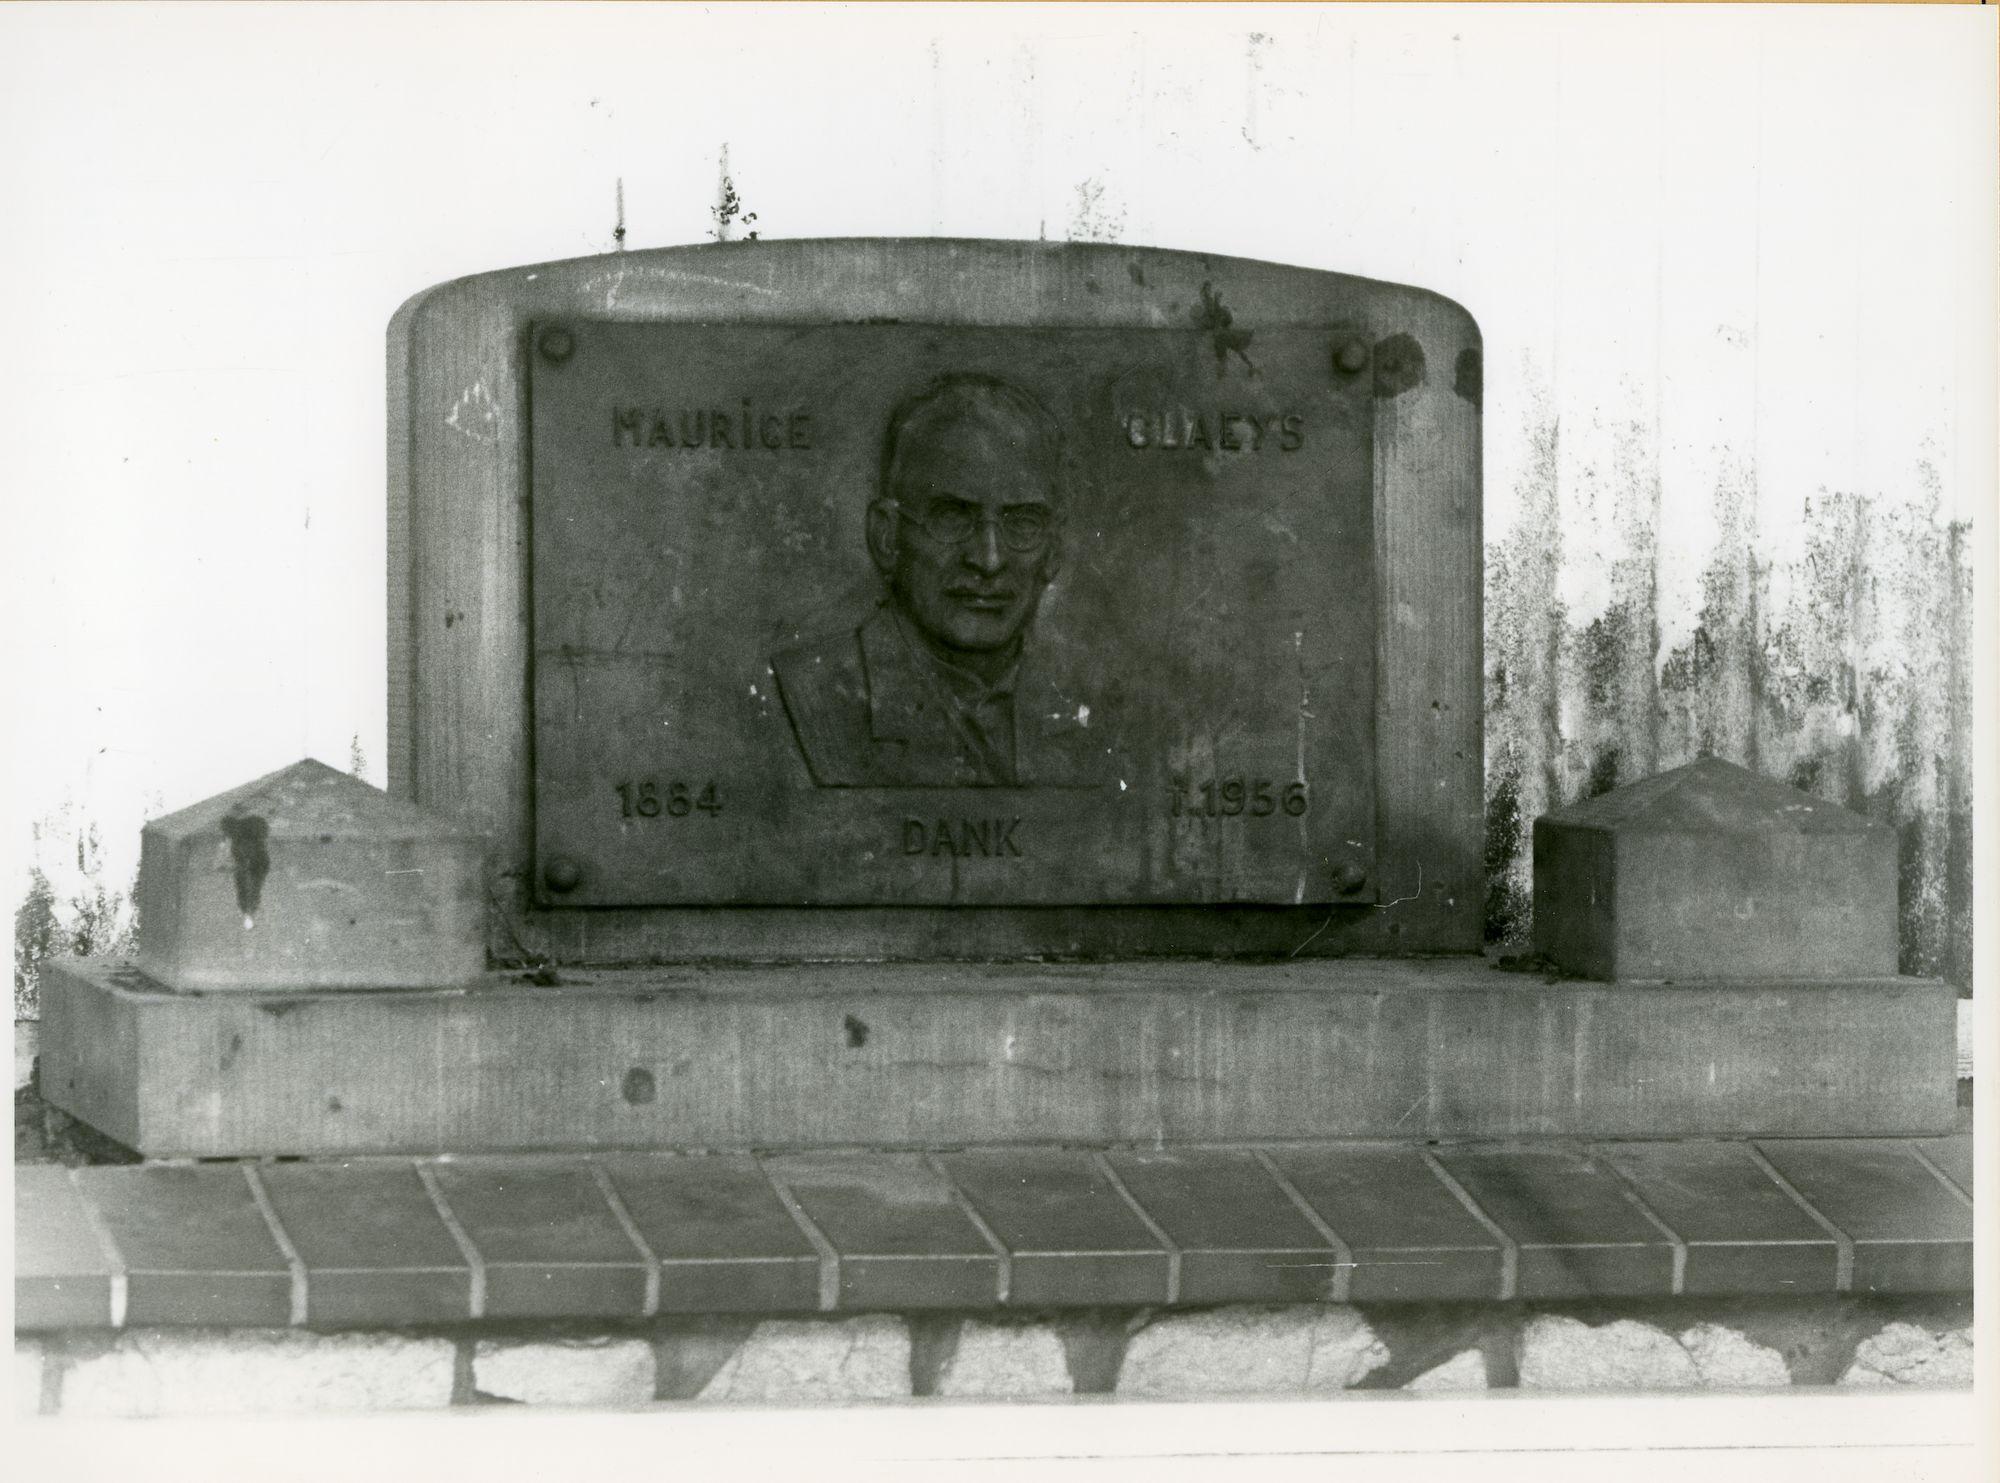 Mariakerke: Maurice Claeysplein: Gedenkplaat, 1979